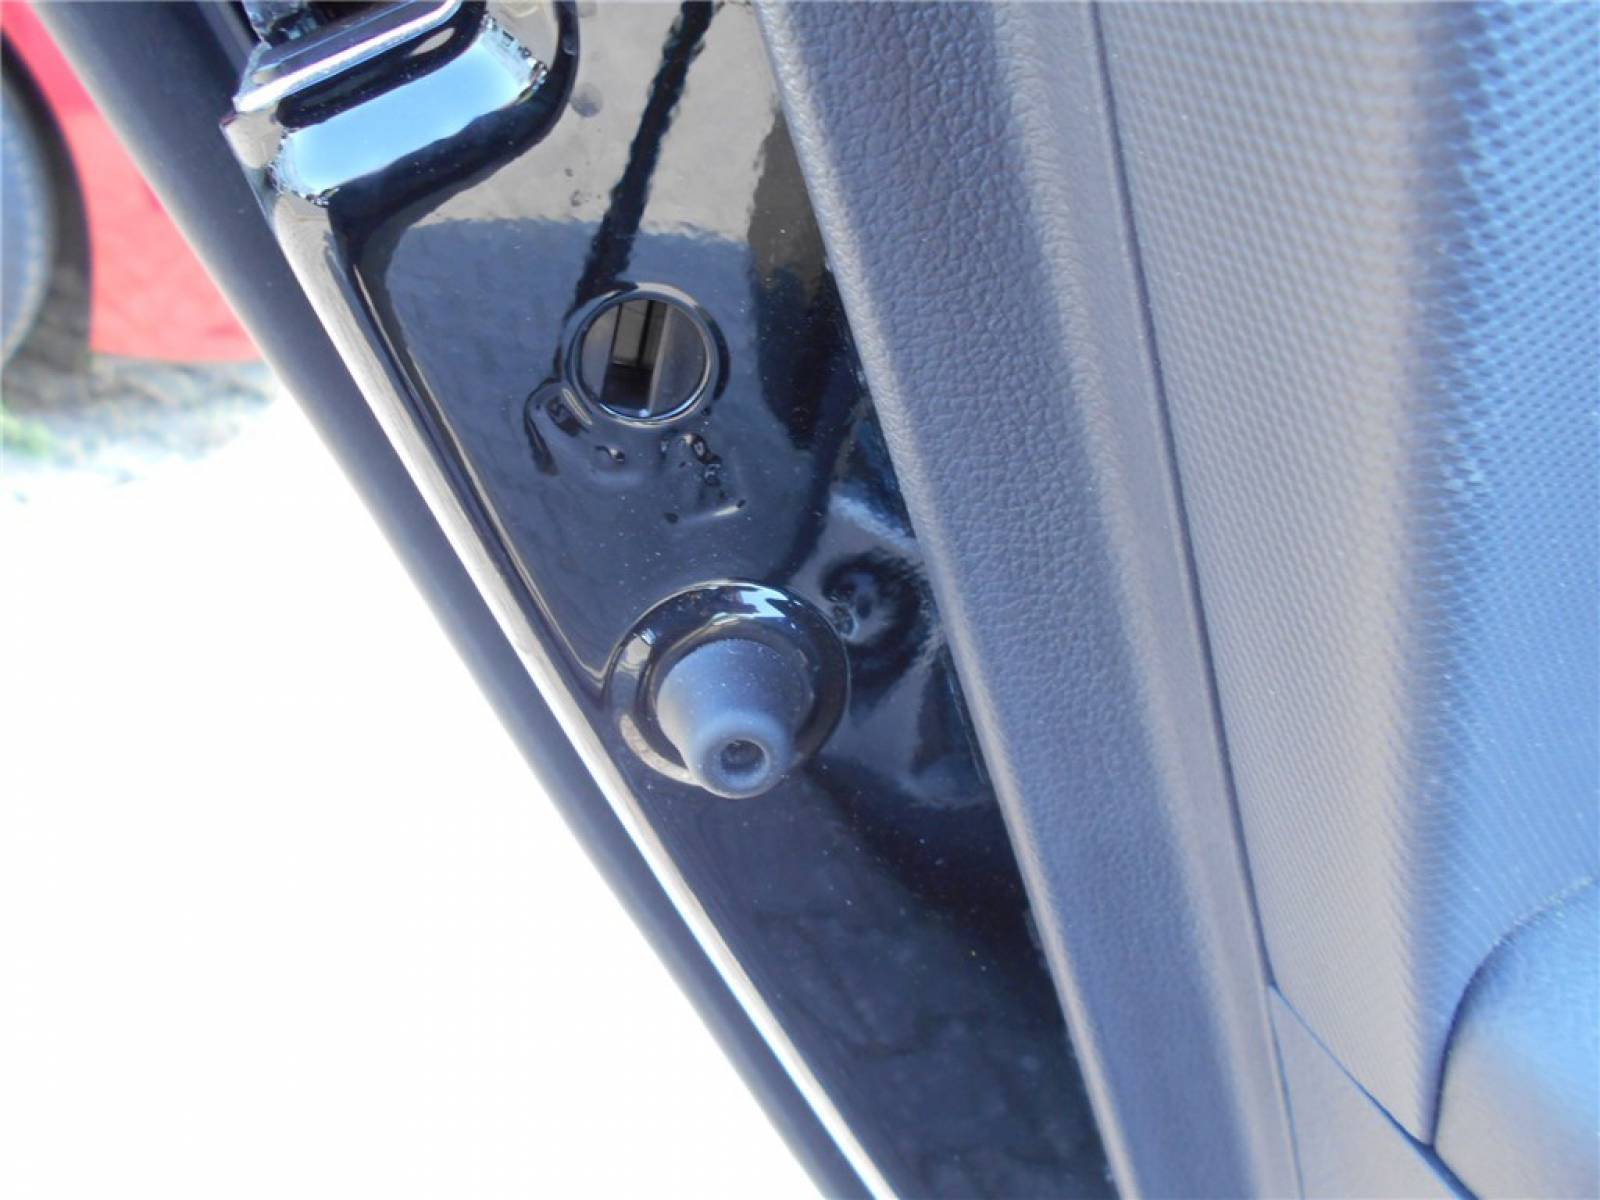 HYUNDAI Ioniq Plug-in 141 ch - véhicule d'occasion - Groupe Guillet - Chalon Automobiles - 71100 - Chalon-sur-Saône - 7